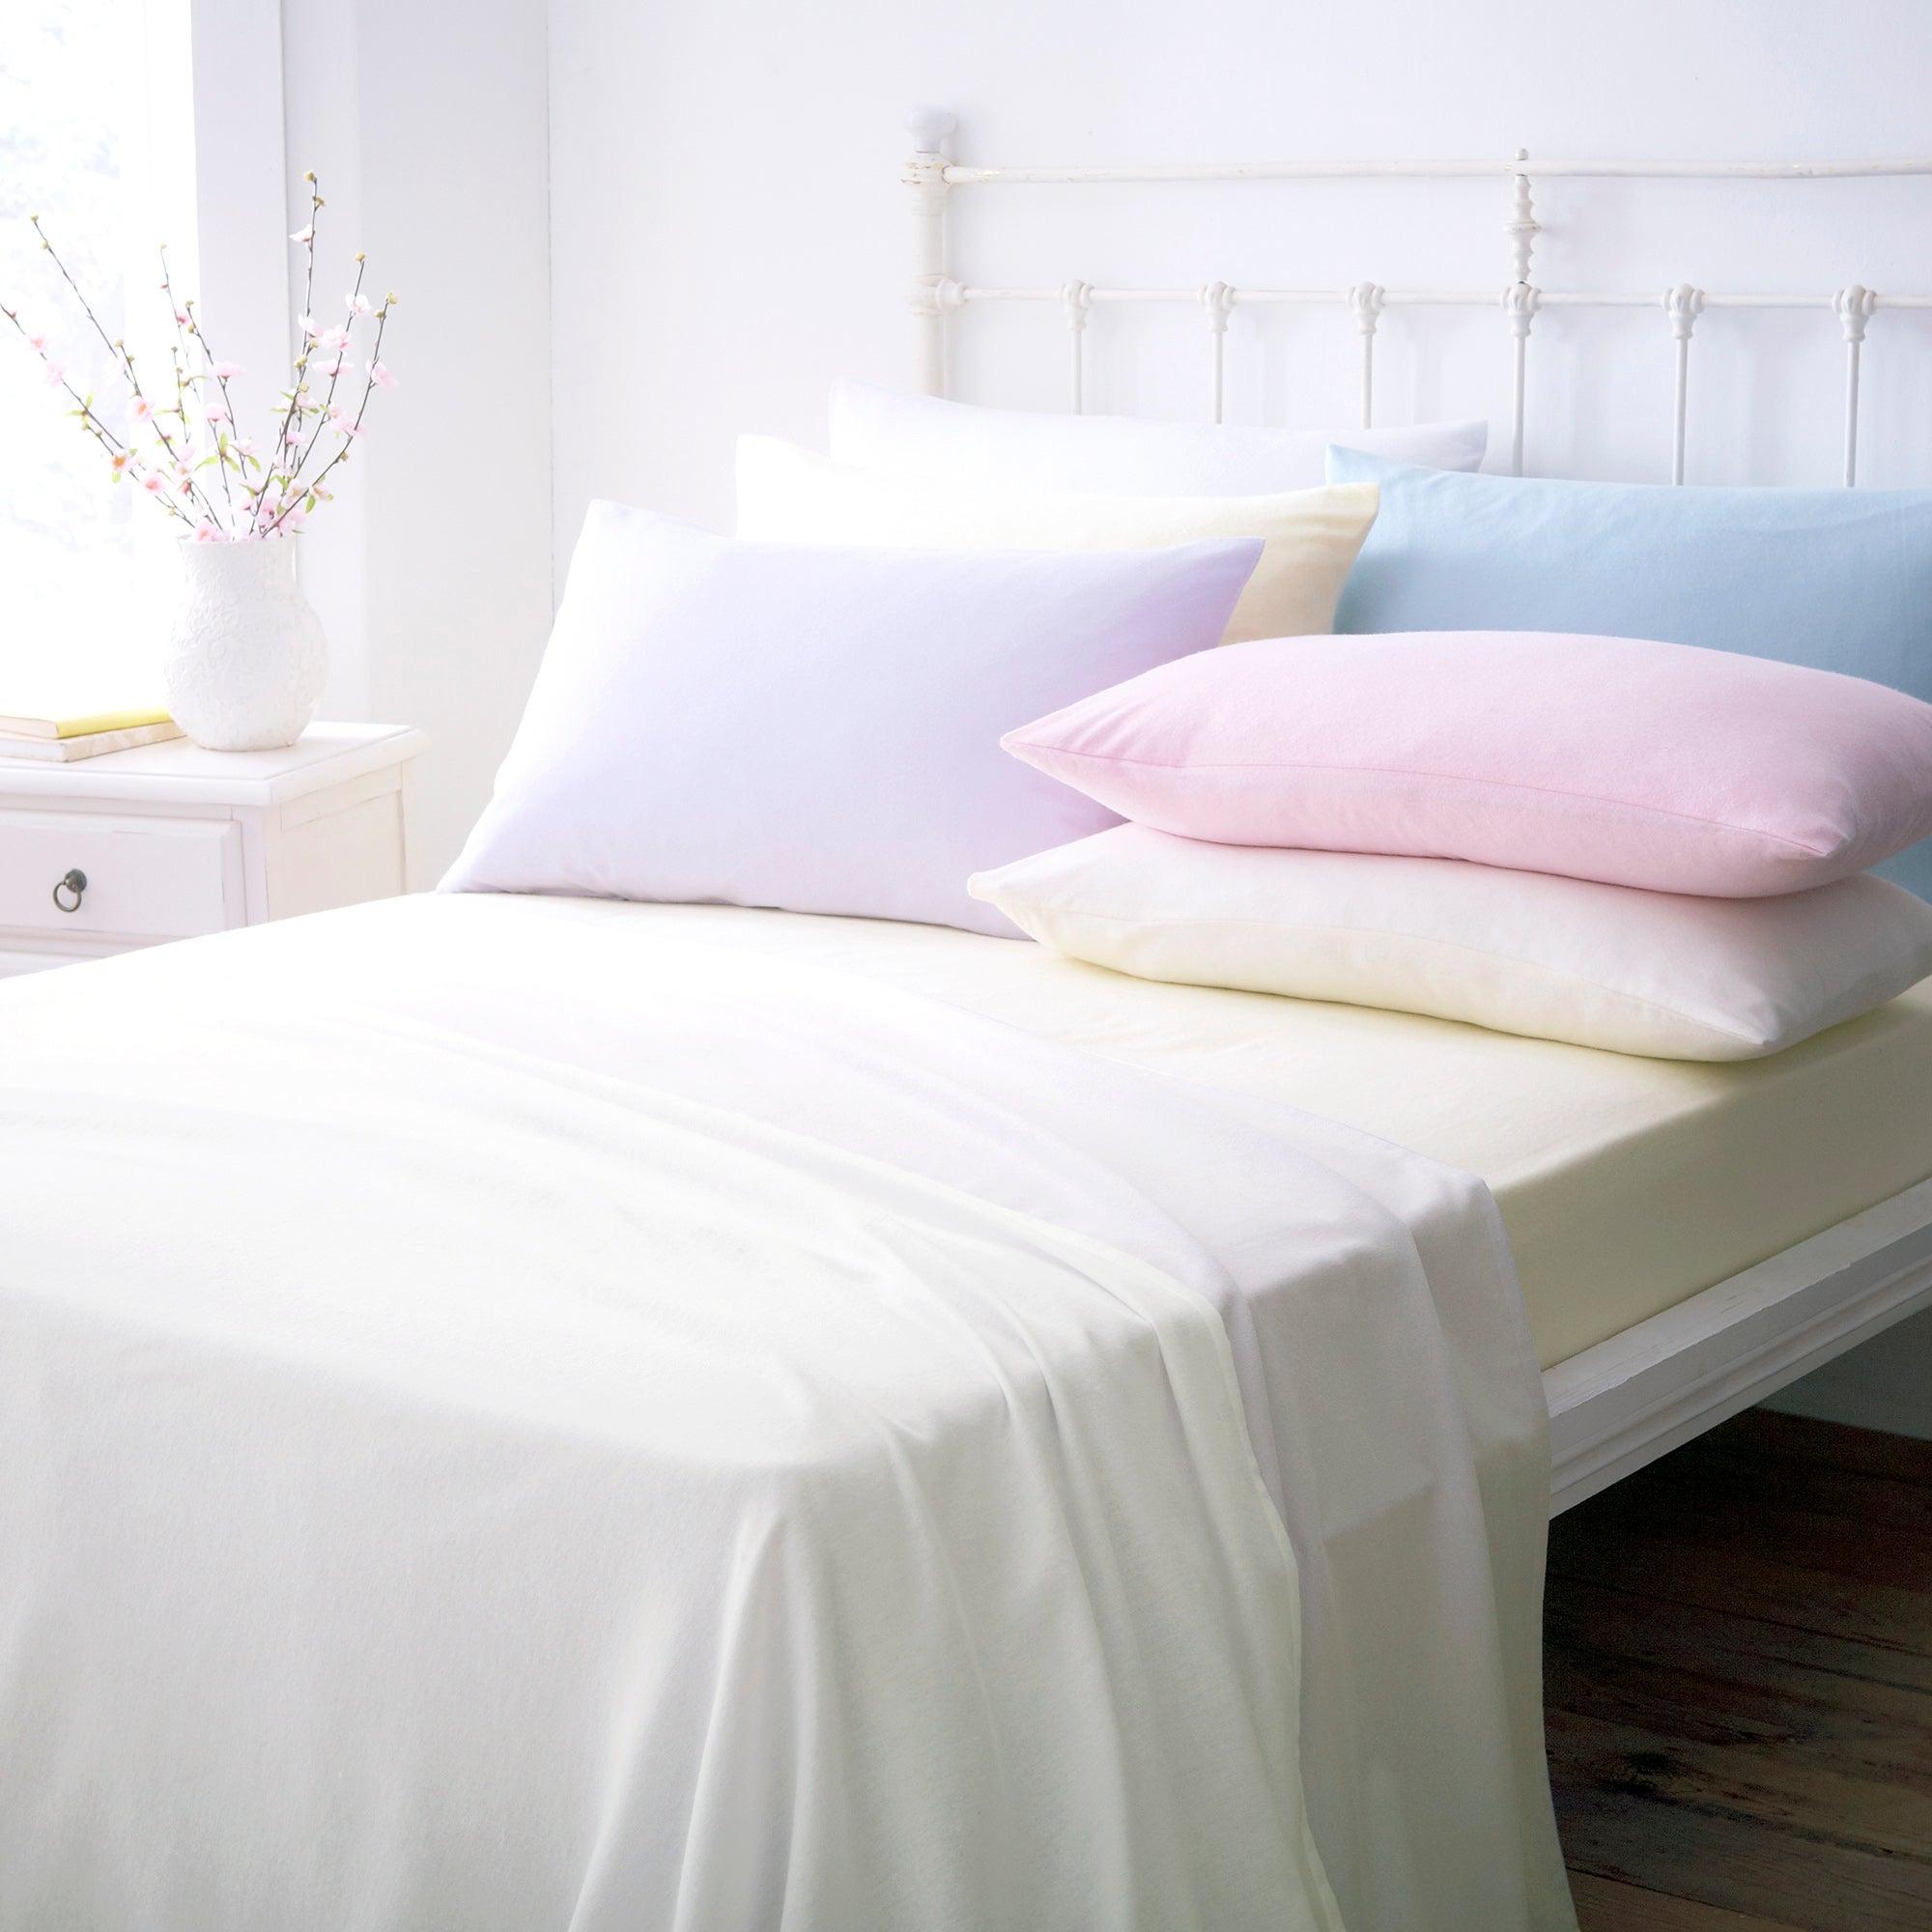 Brushed Cotton Sheet Sets